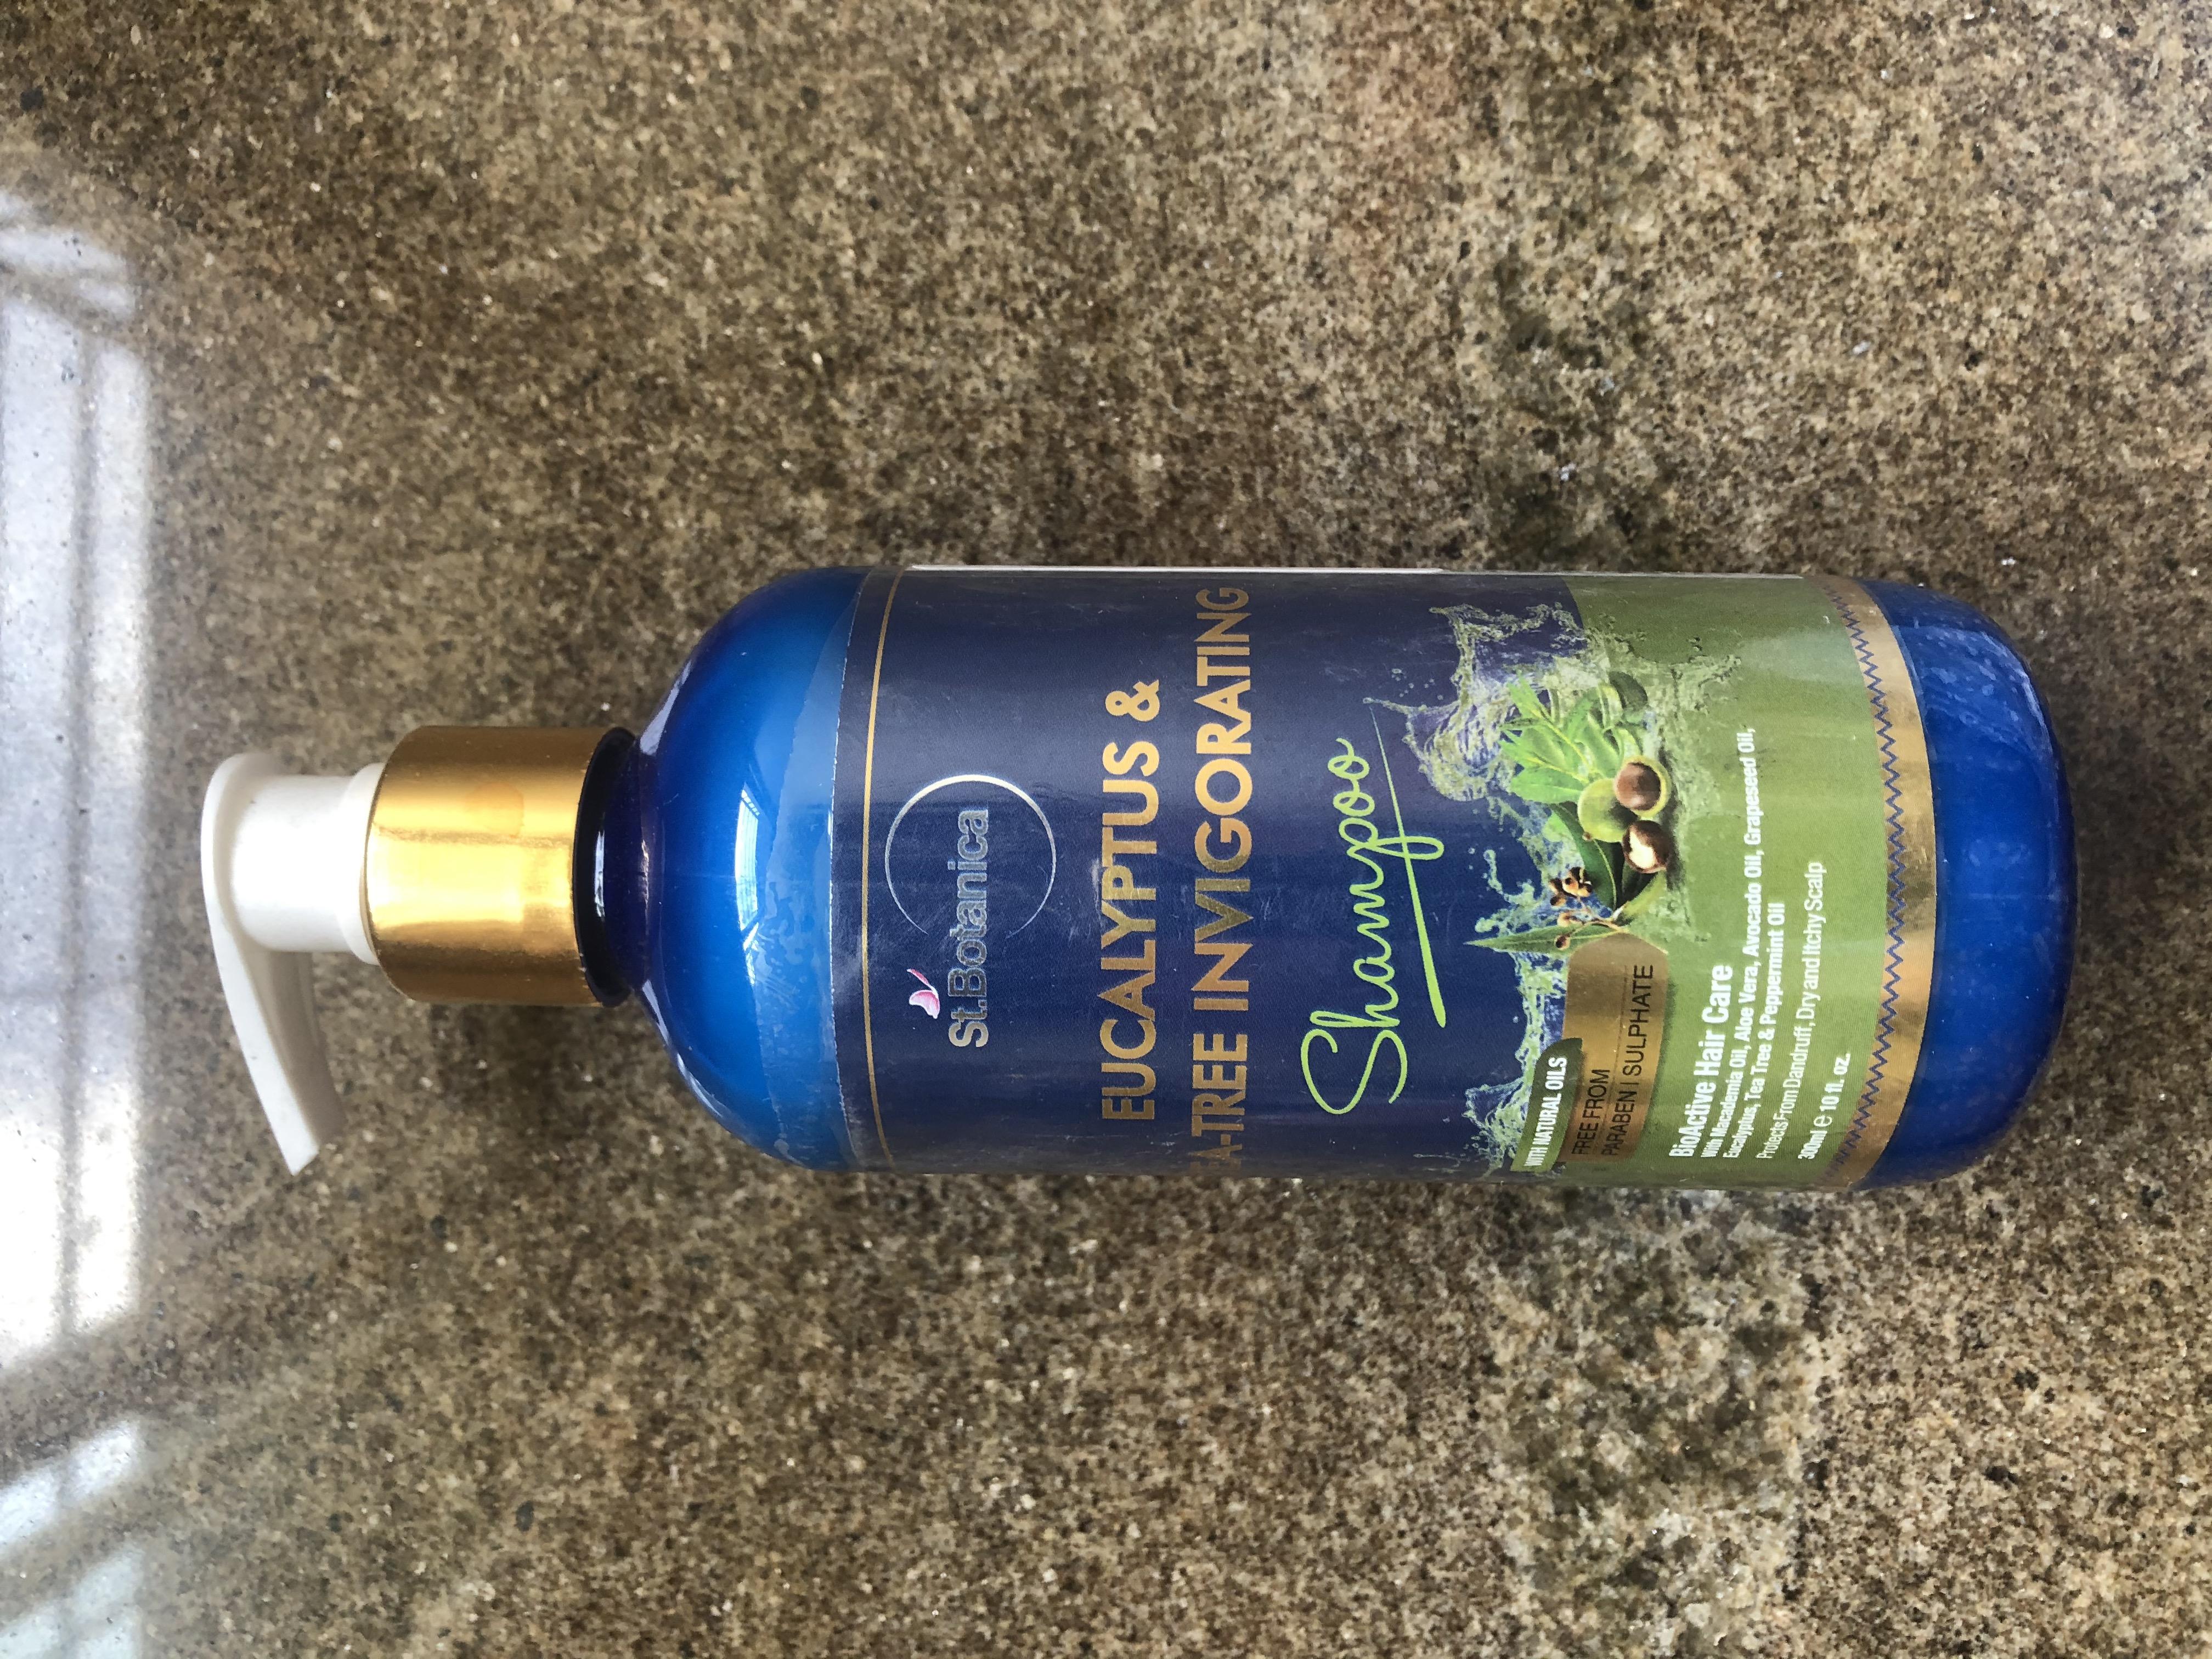 St.Botanica Eucalyptus & Tea Tree Dry Hair Repair Shampoo-Best to treat dry and itchy scalp-By revati_palshetkar-1